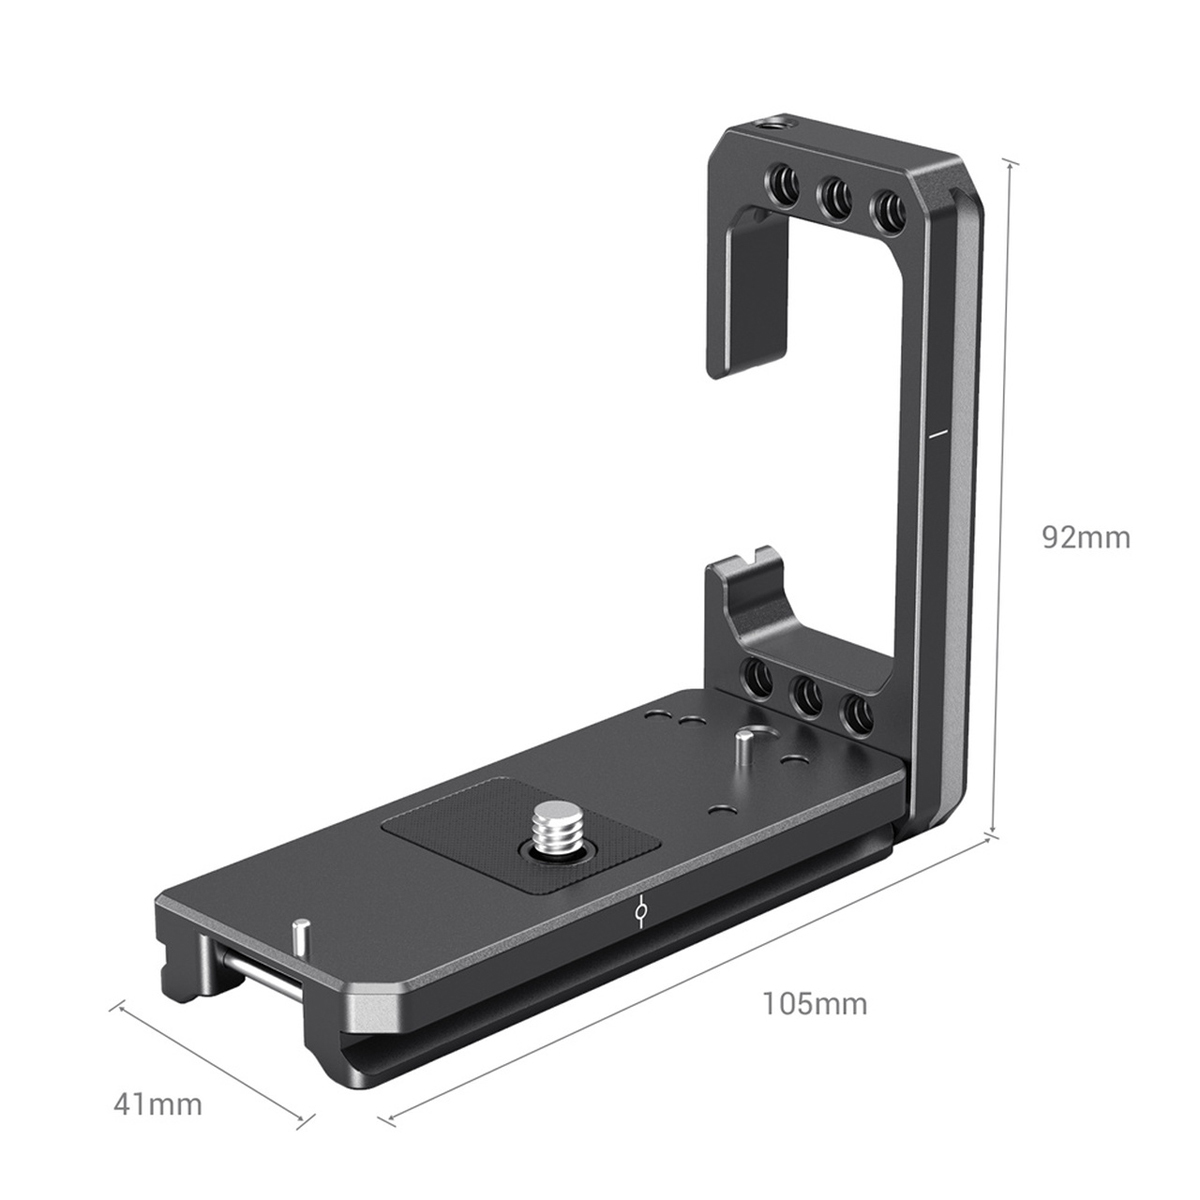 Smallrig L-Winkel für Canon EOS R5 / R6 2976